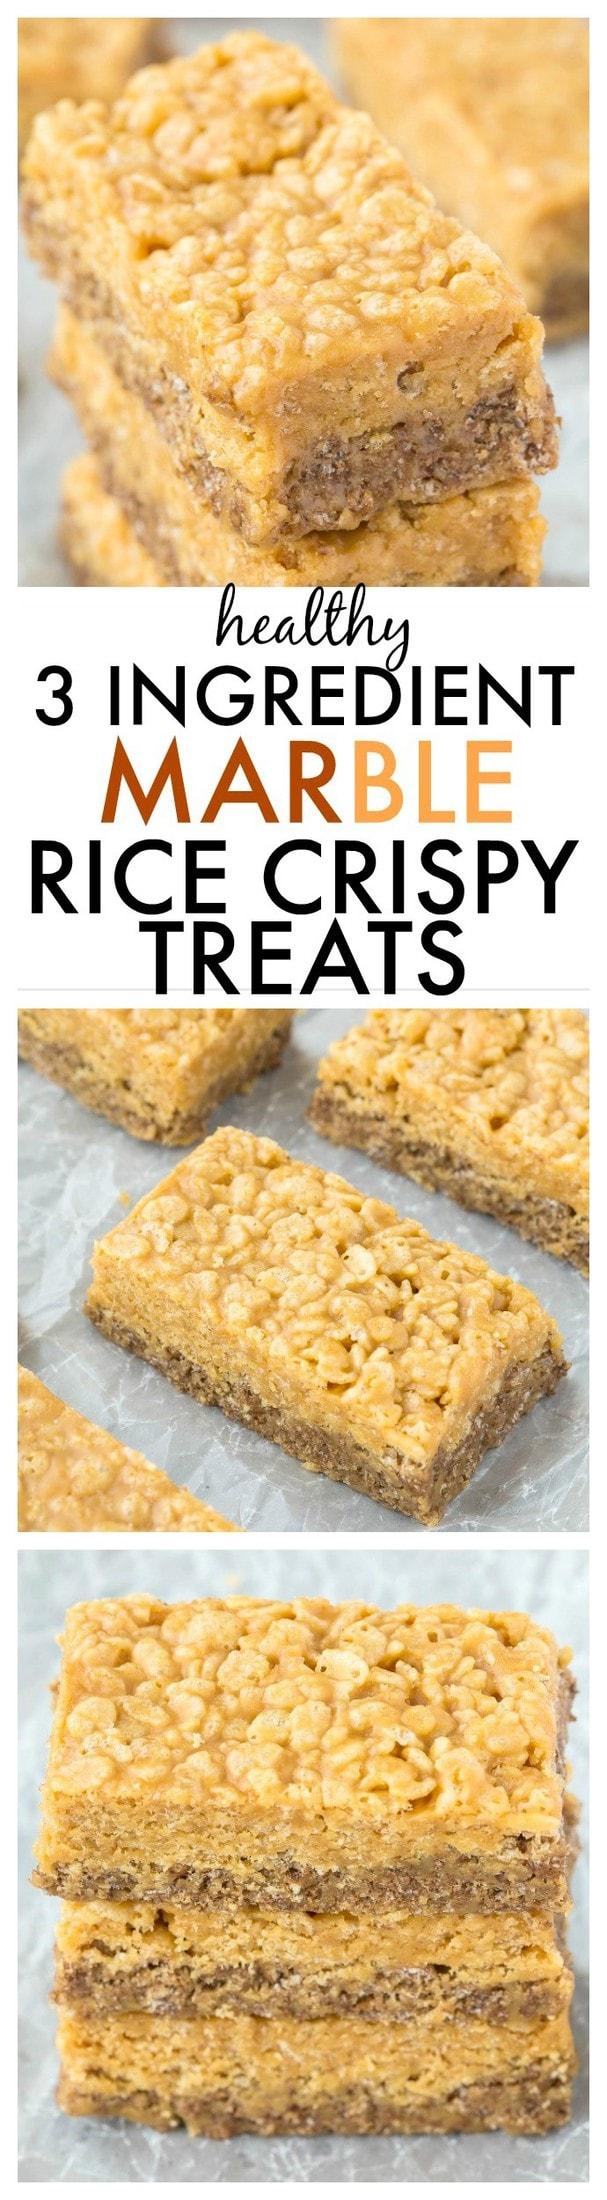 Natural Rice Crispy Treats